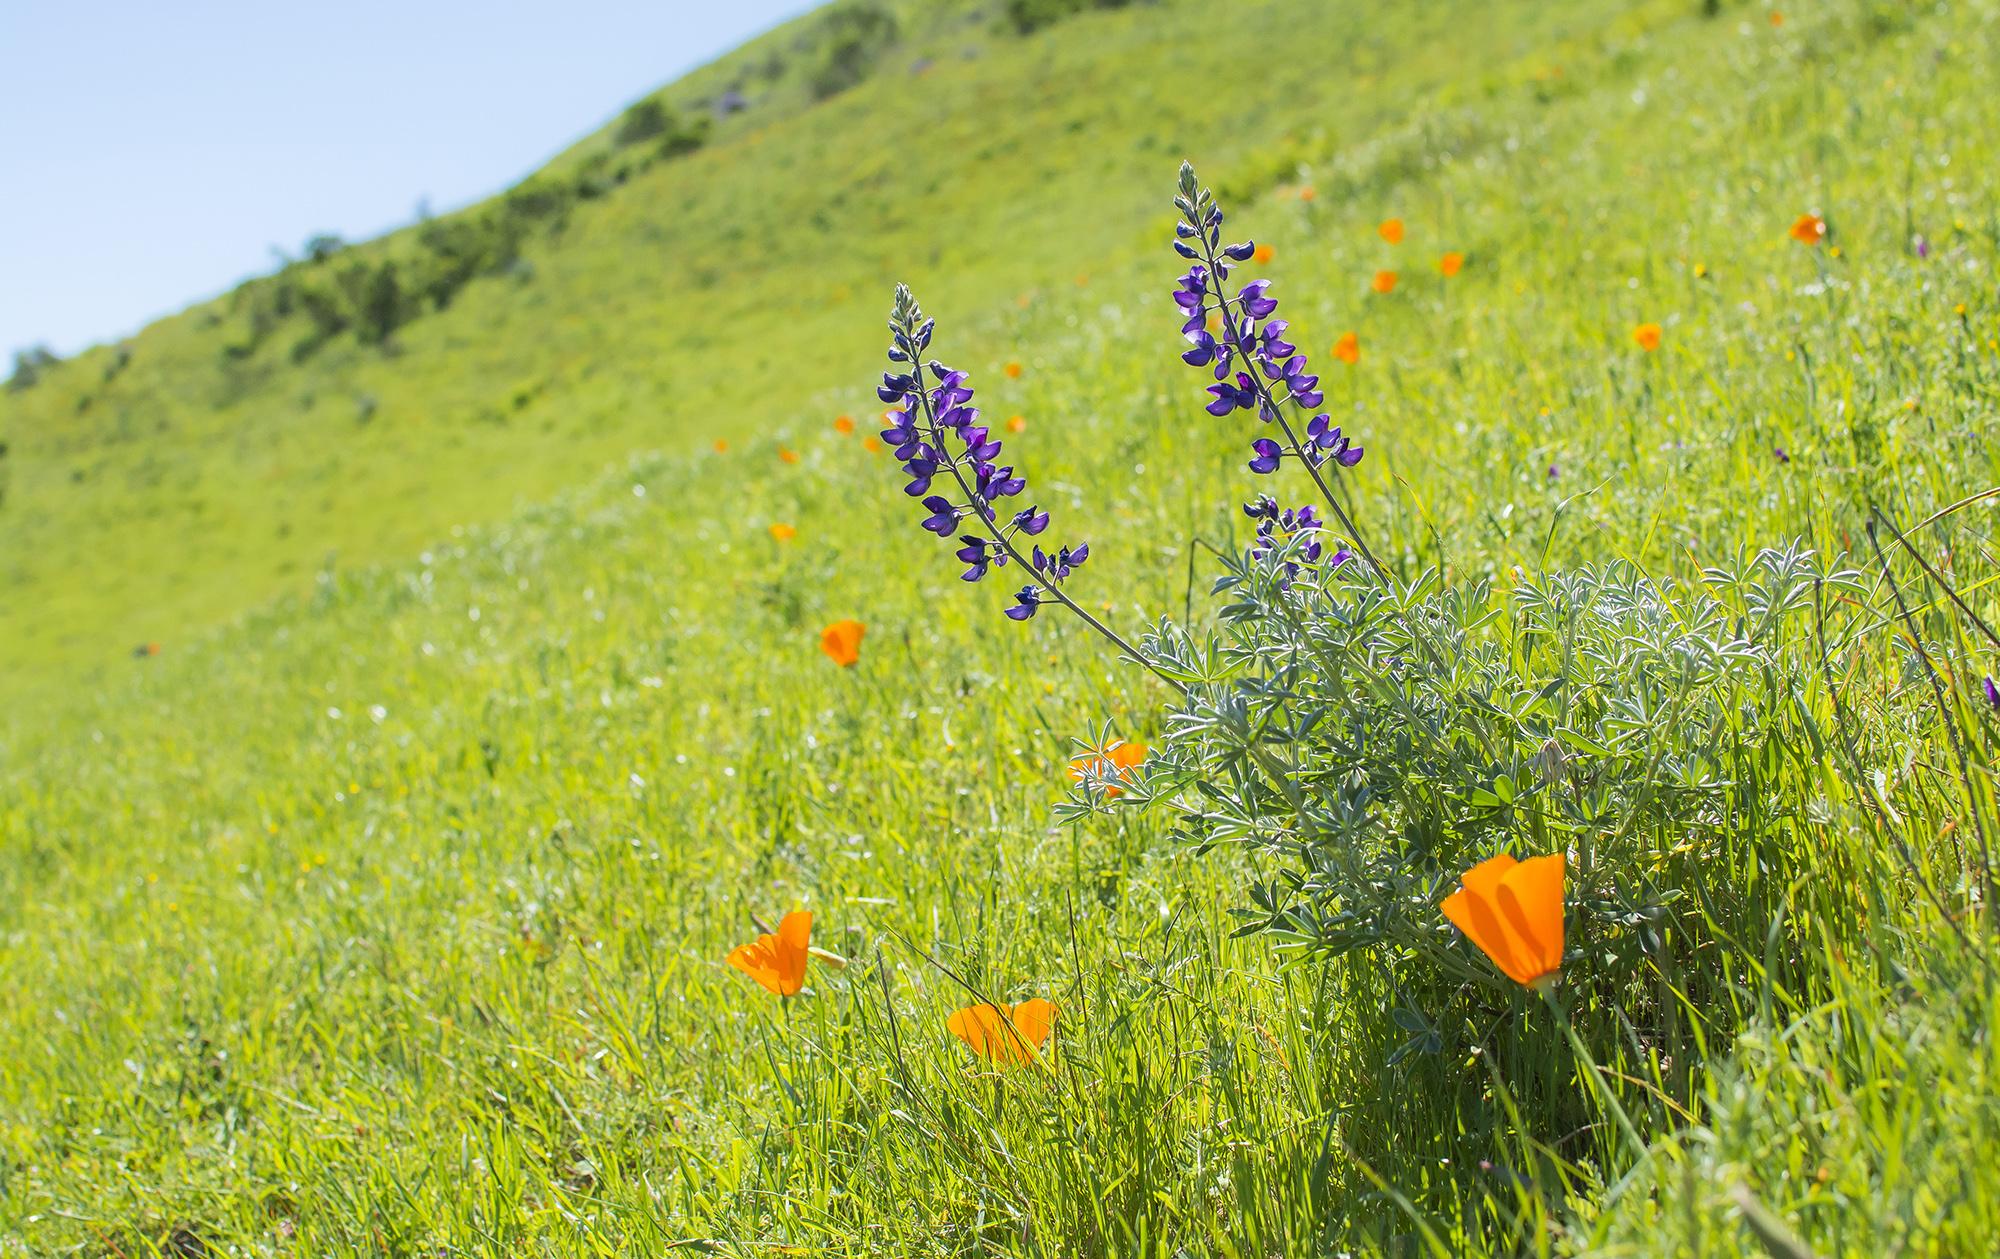 Silver lupine ( Lupinus albifrons ) grows amongst California poppies ( Eschscholzia californica )on a hillside in Las Trampas Regional Wilderness